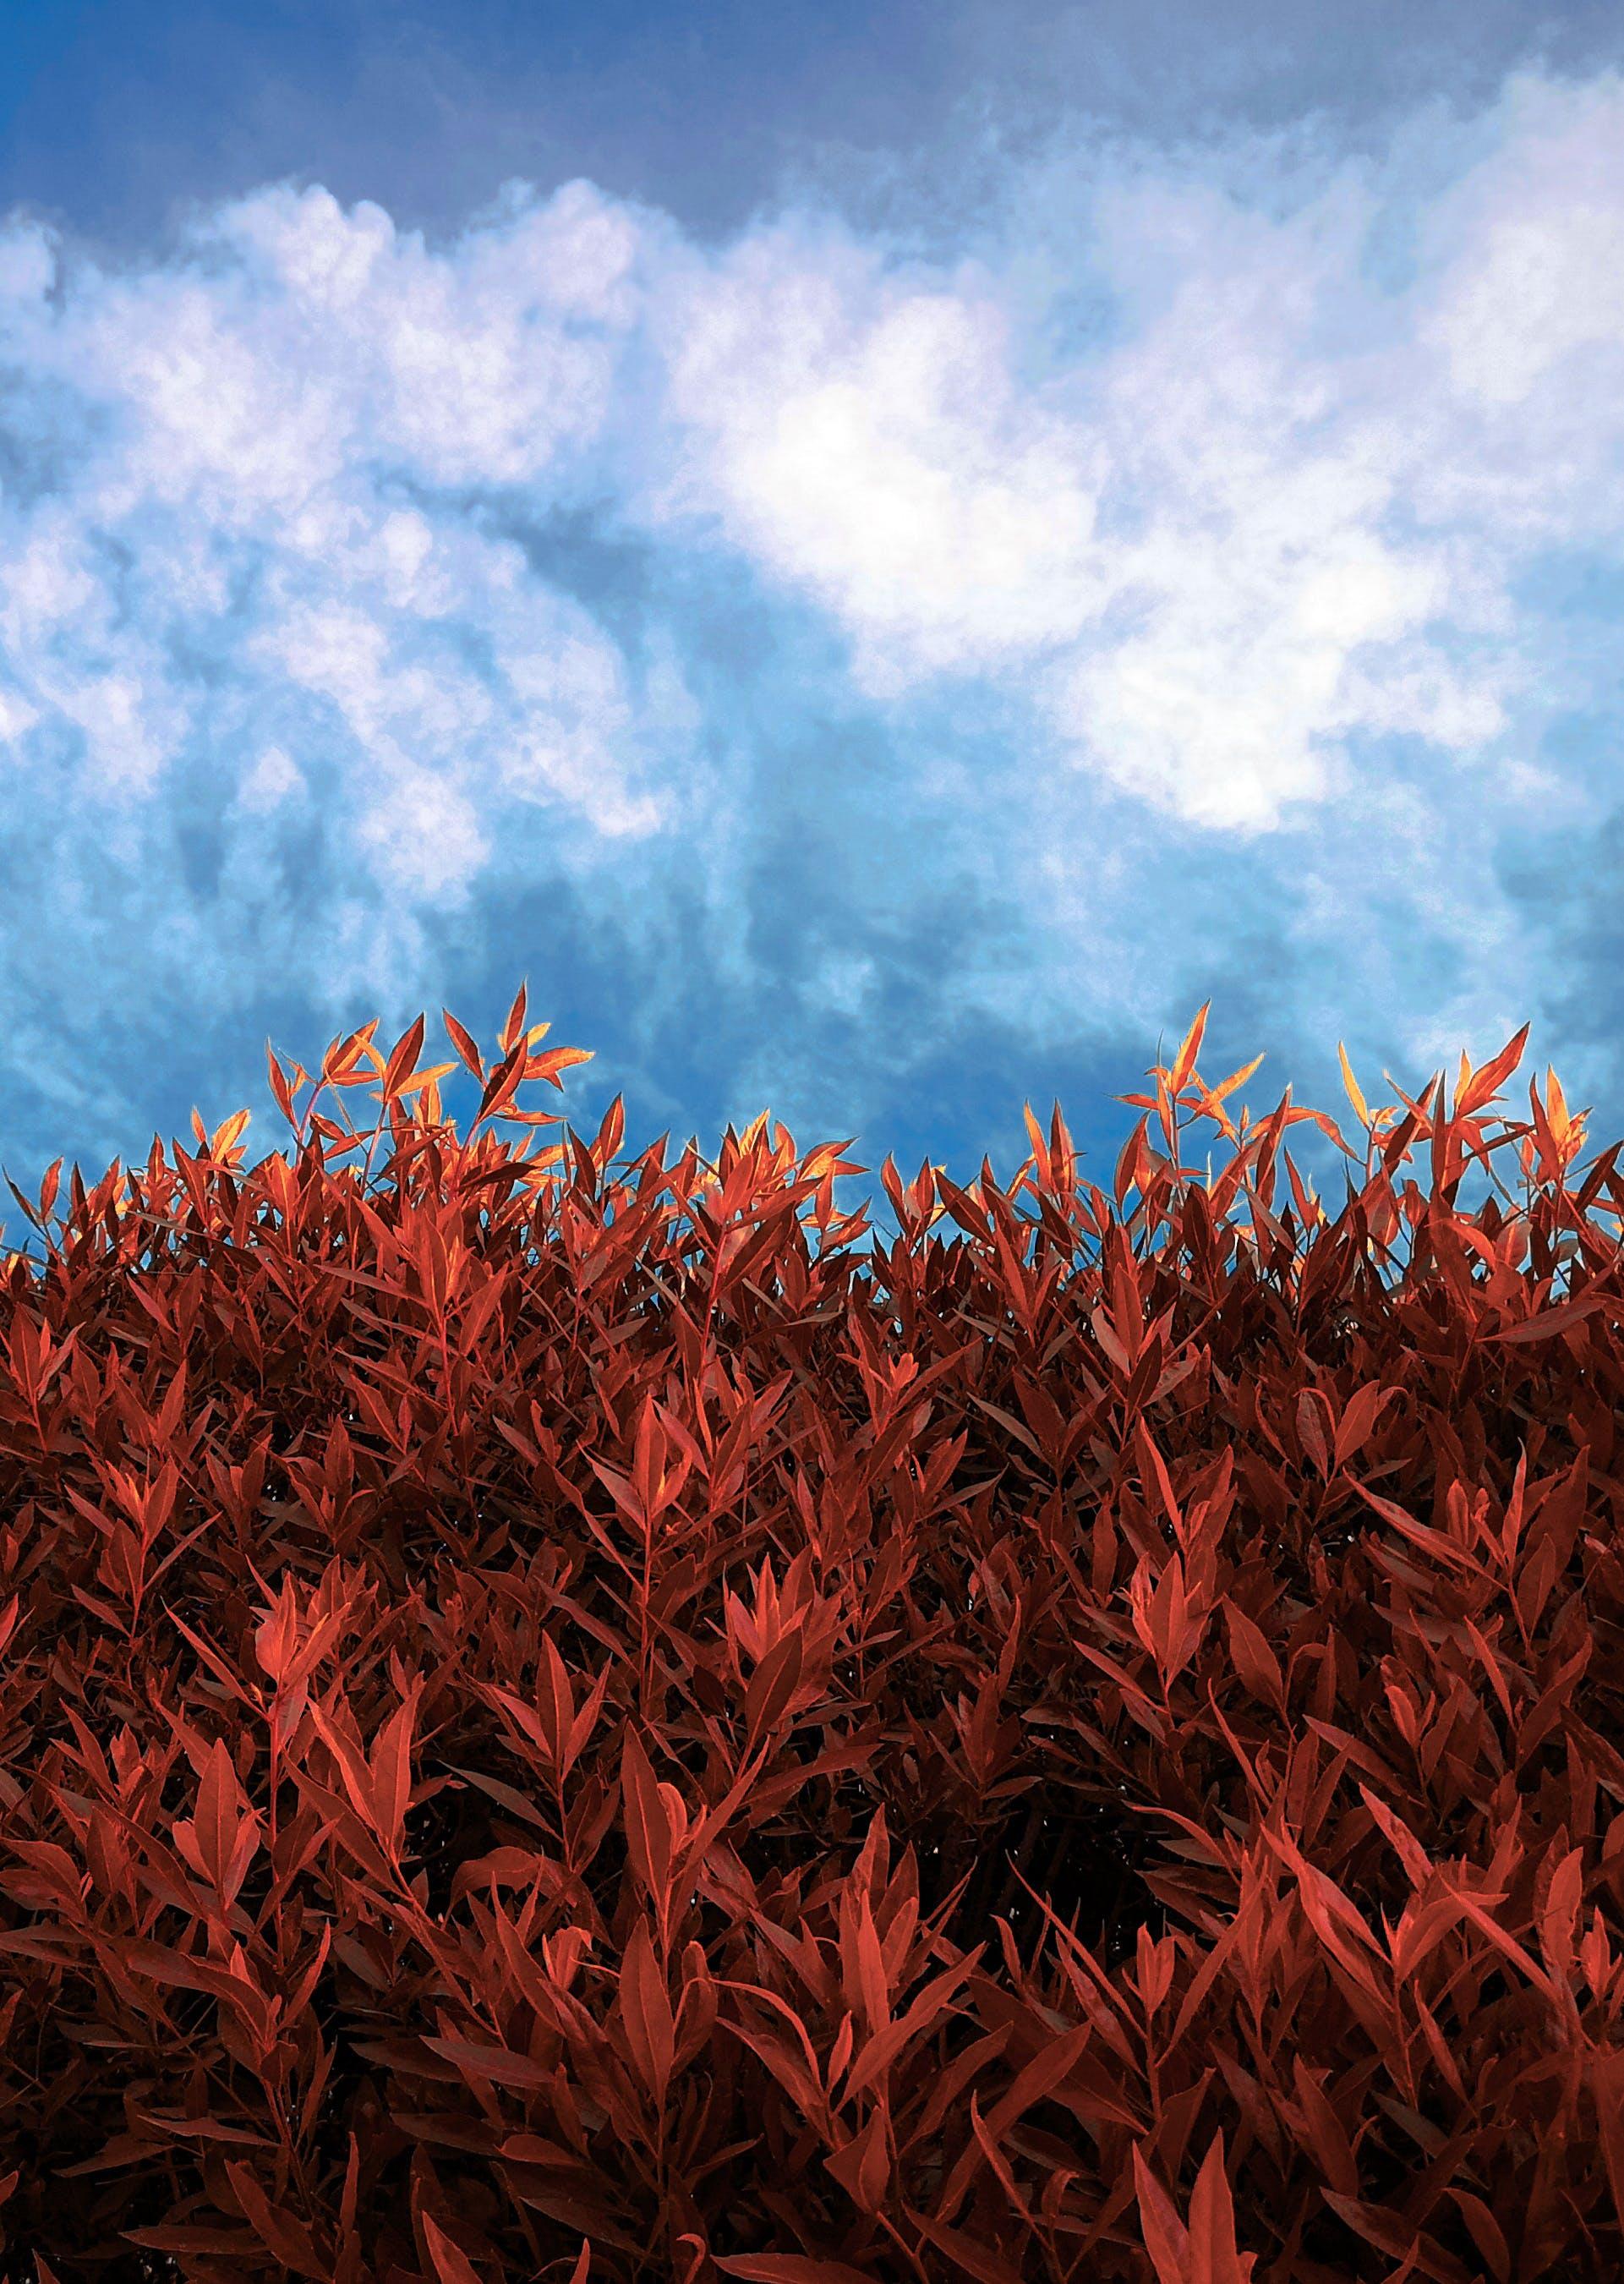 Free stock photo of blue sky, flower, red flower, tree